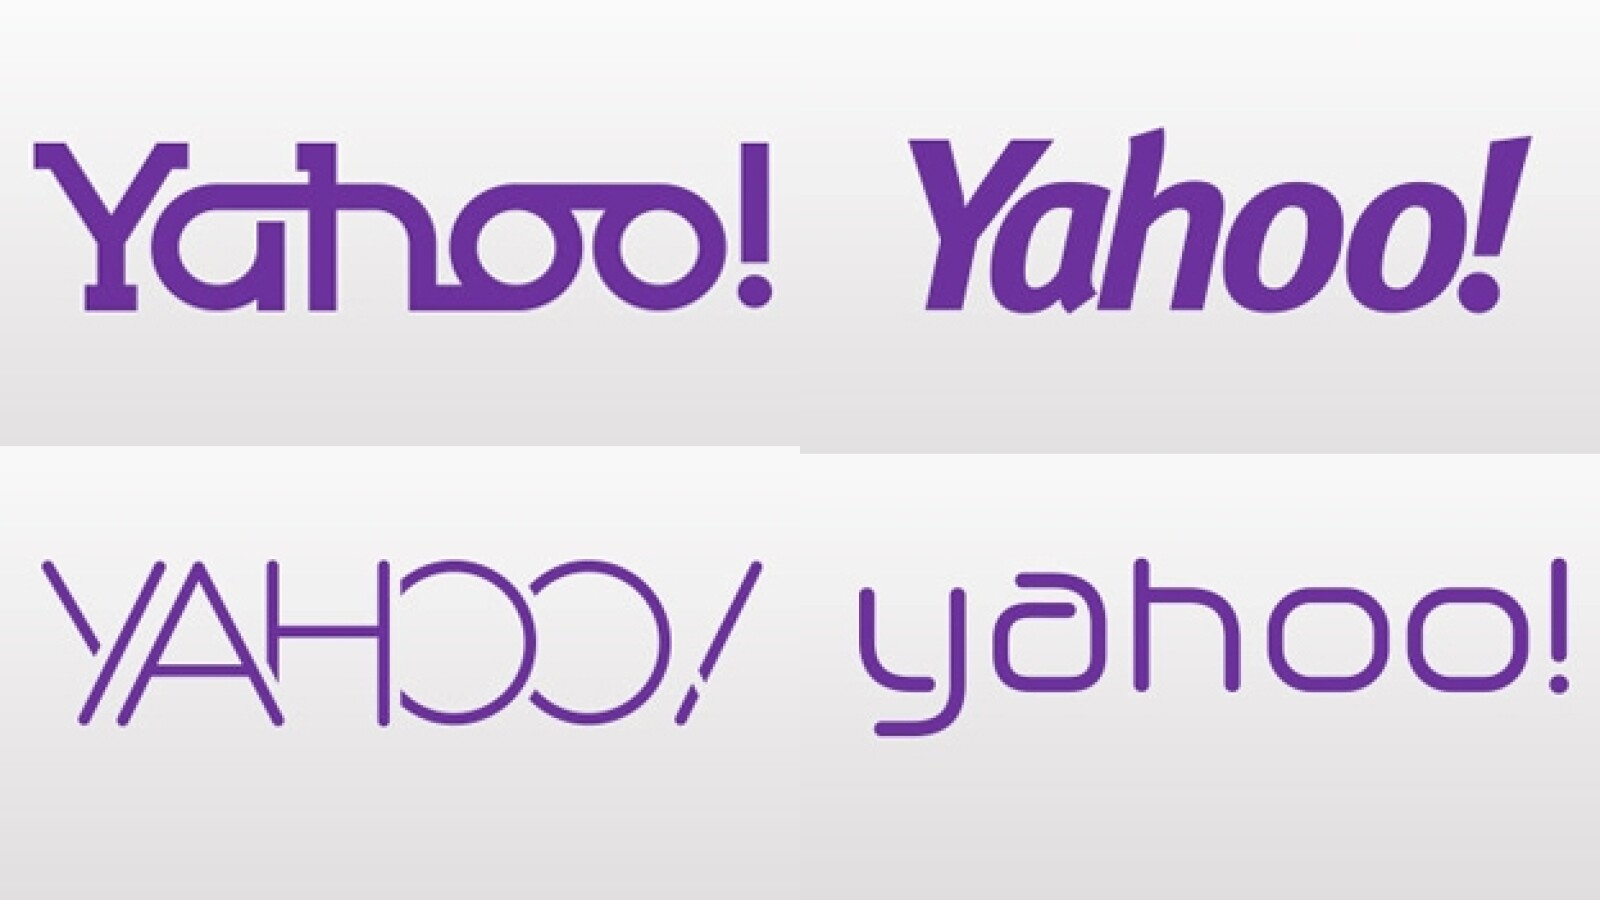 logo de yahoo 1